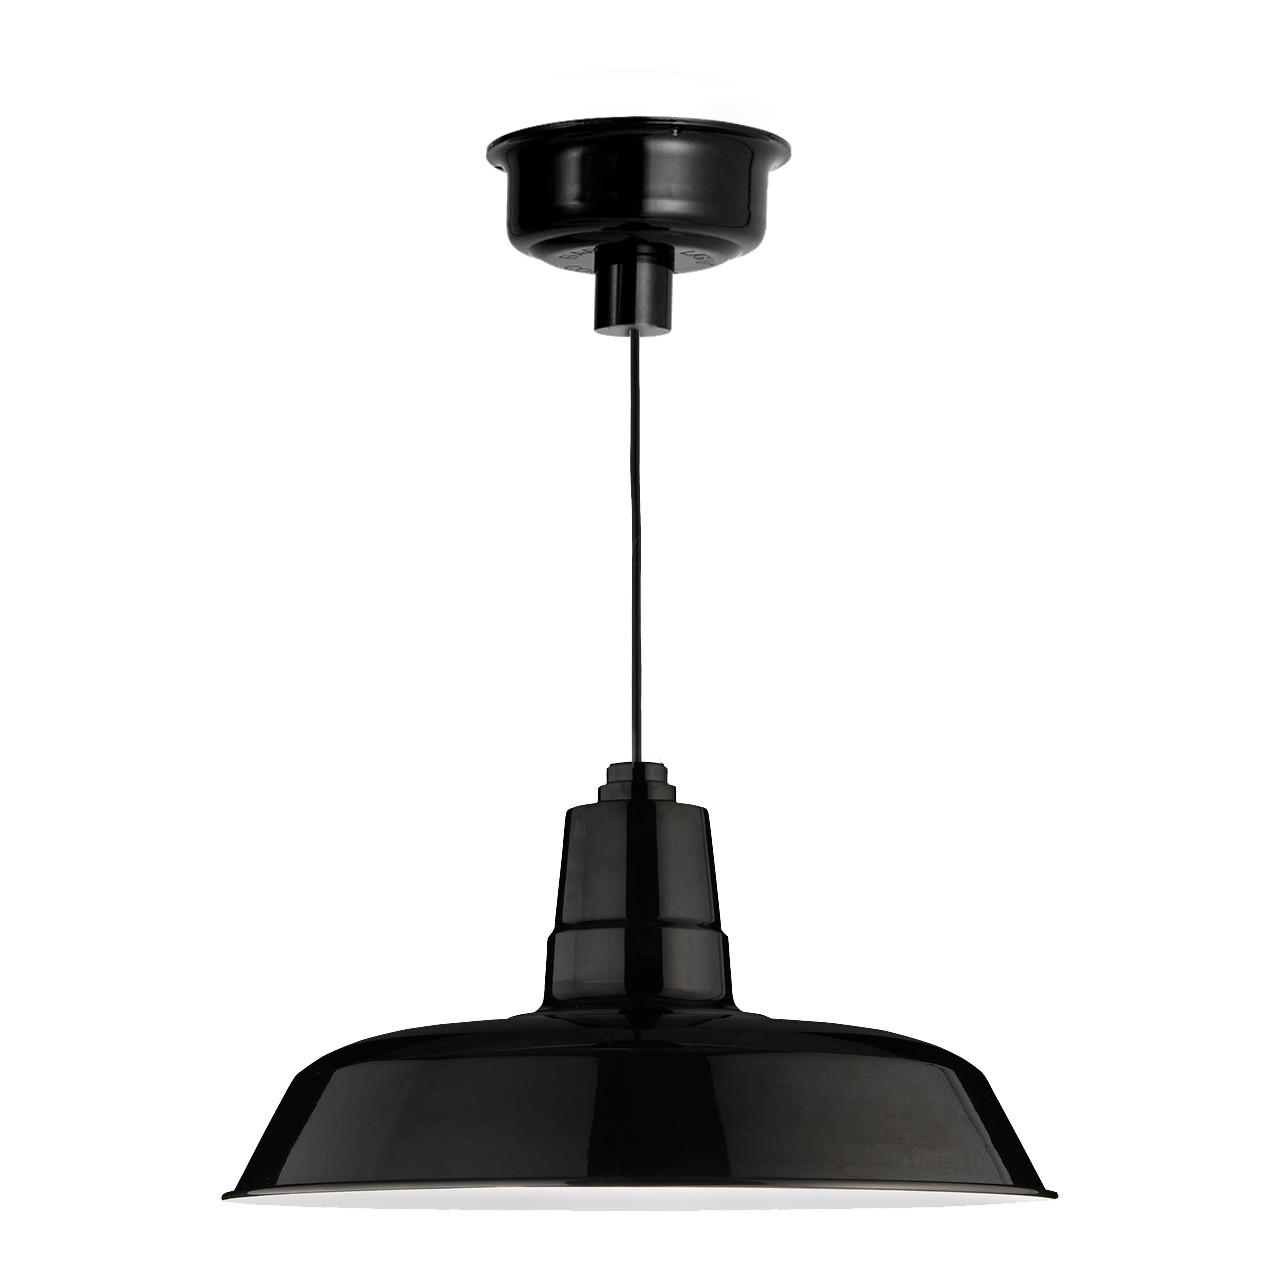 Lighting For Barns: Ceiling Oldage Indoor LED Barn Light Fixture